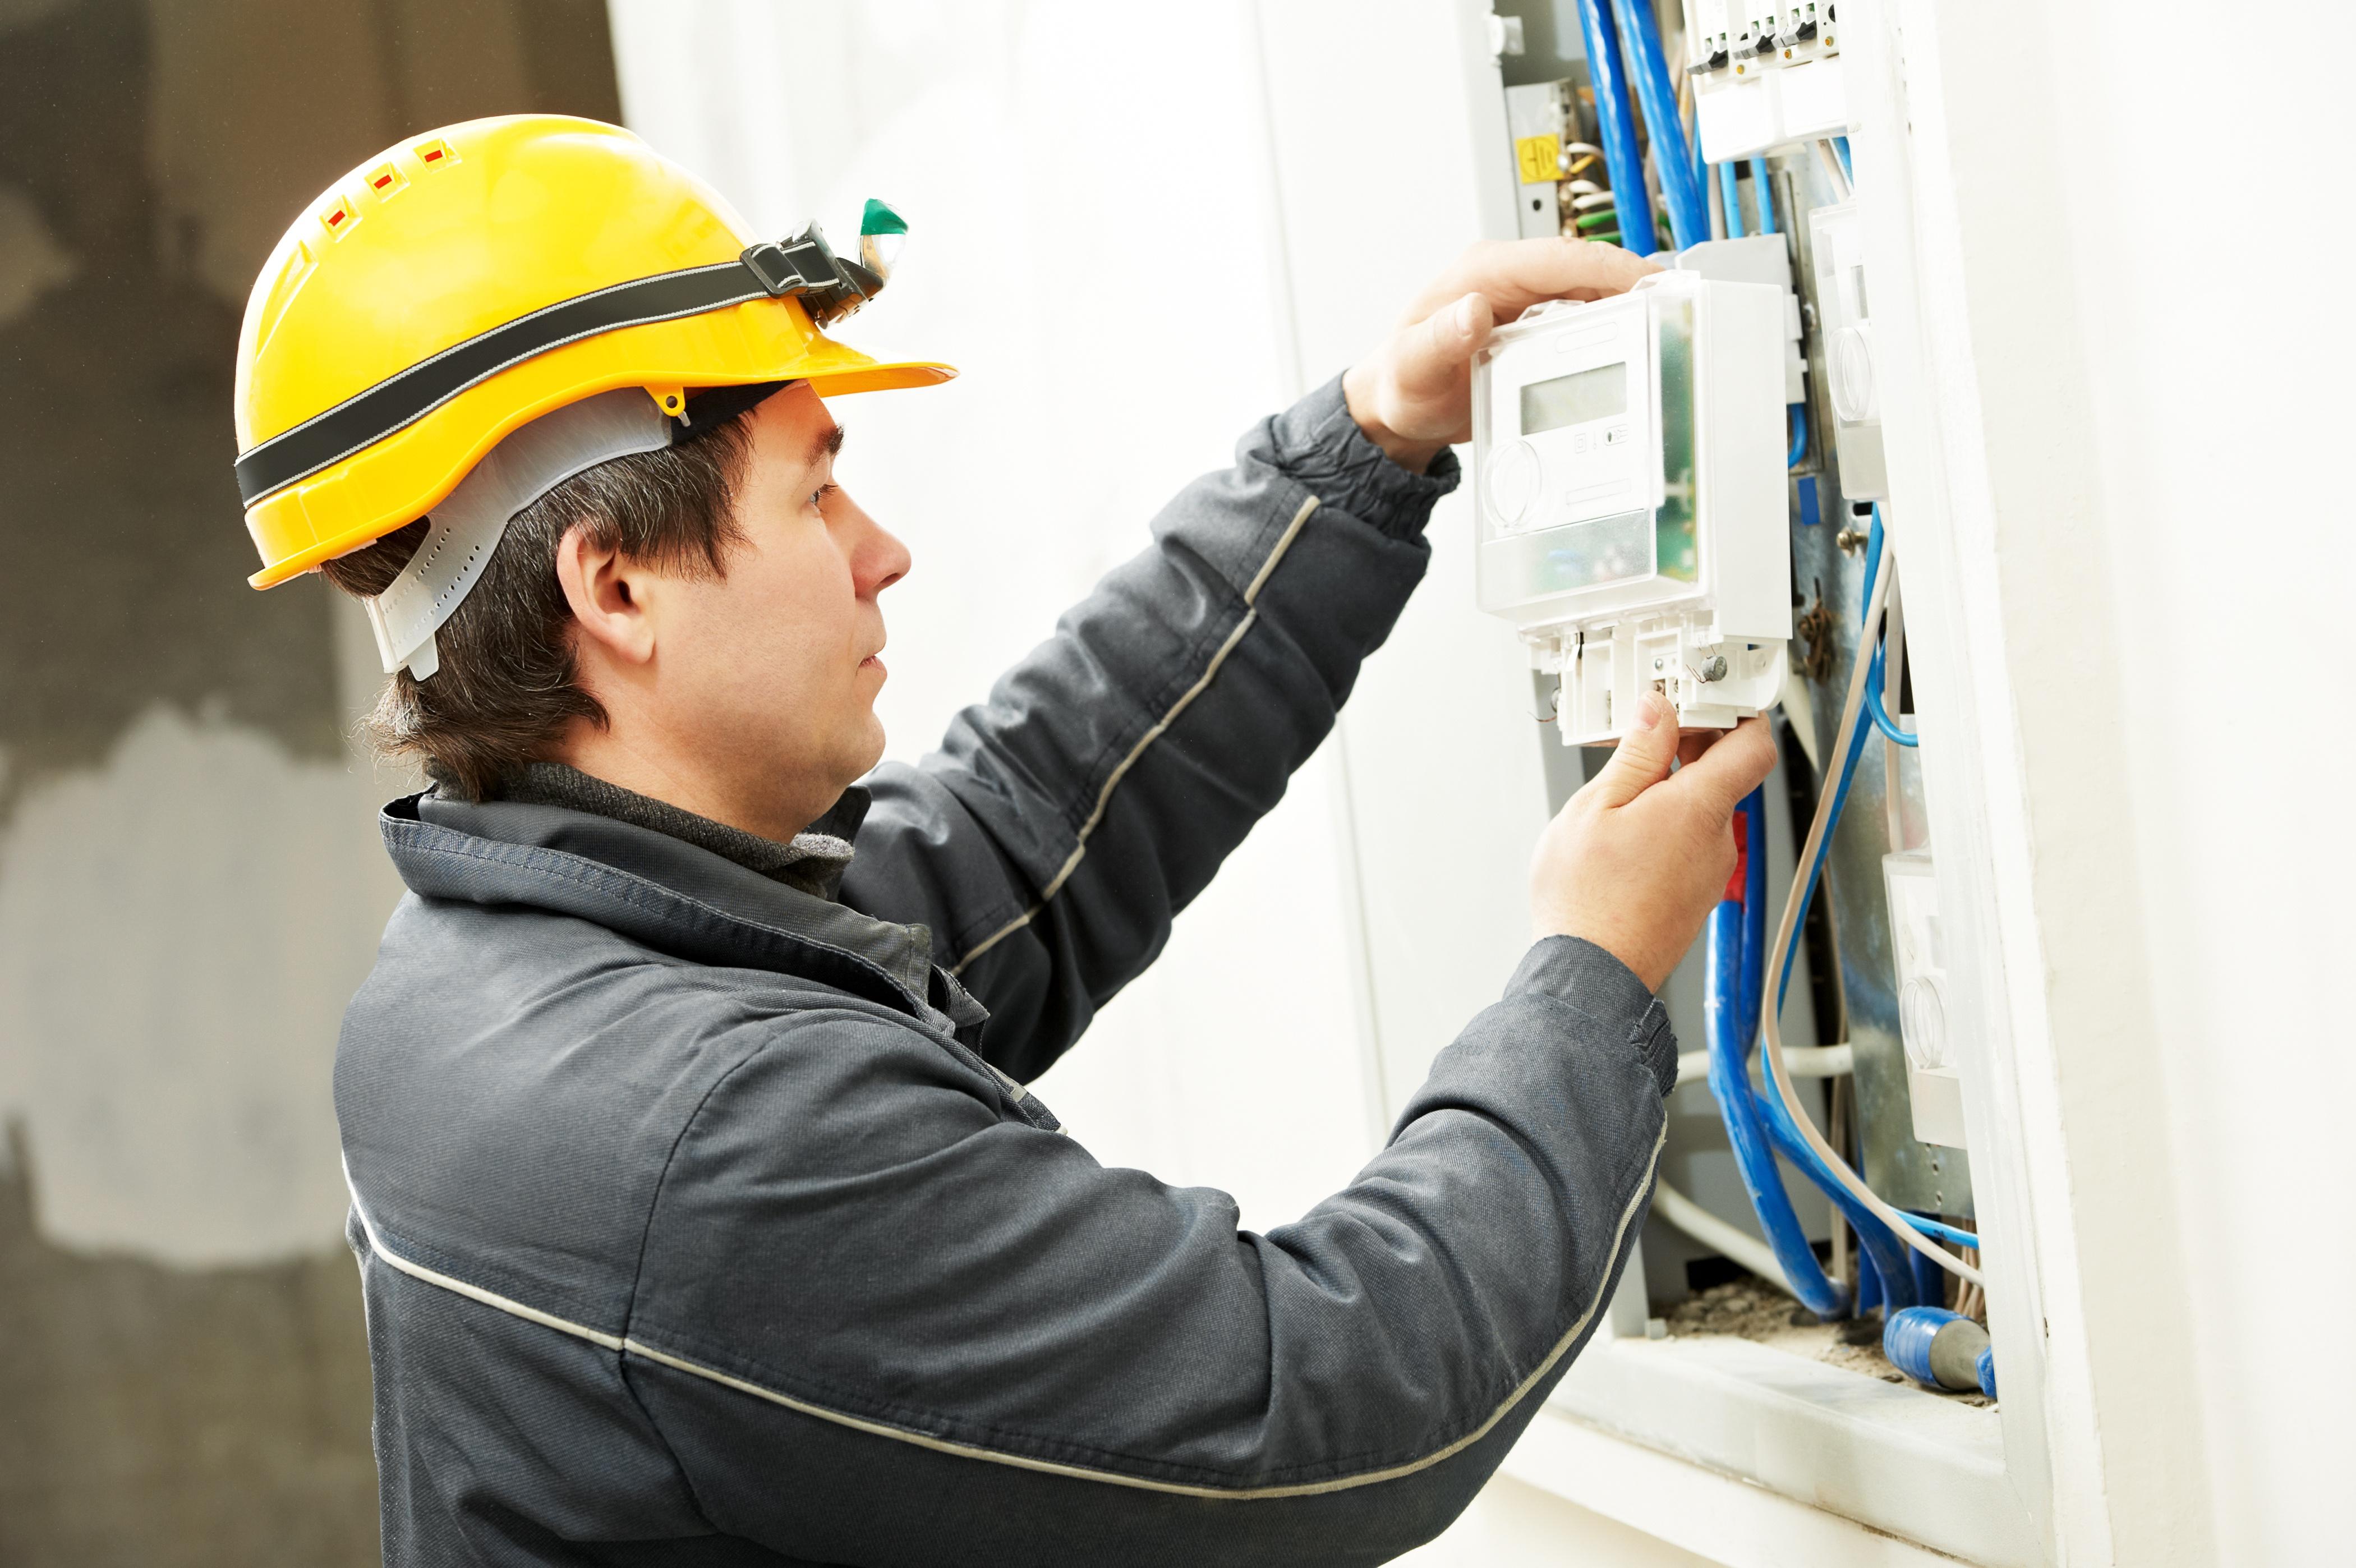 bigstock-Electrician-installing-energy--113637569.jpg